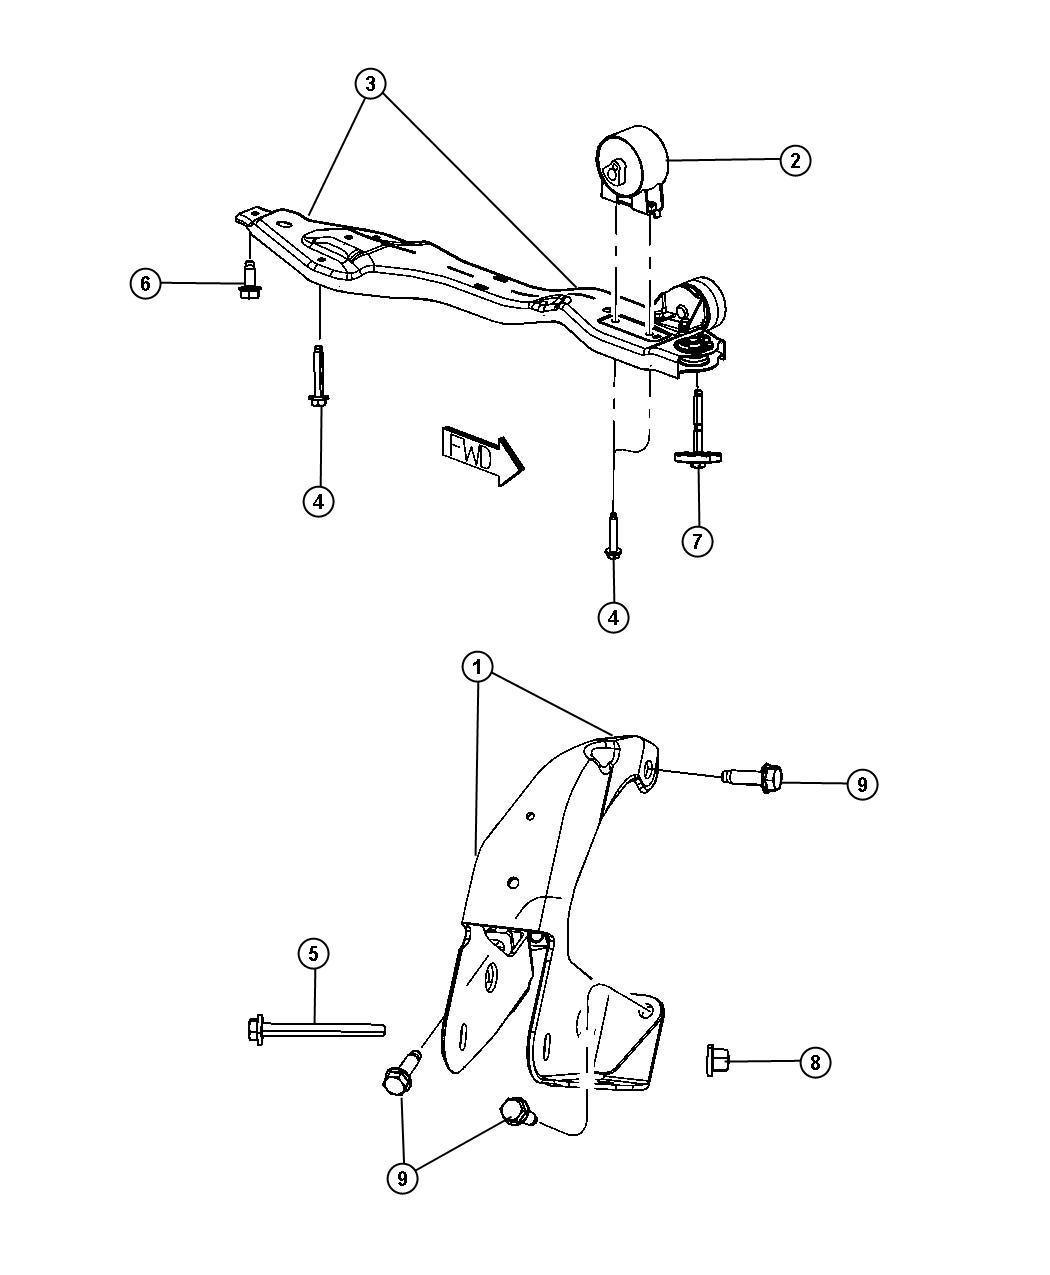 tags: #2004 audi a4 3#nissan 4 0 engine diagram#2009 audi a4 2#audi 2#1998 audi  a4 1#2001 audi a4 1 8 engine diagram#audi a4 1#2001 audi a4 1#2002 audi a 4